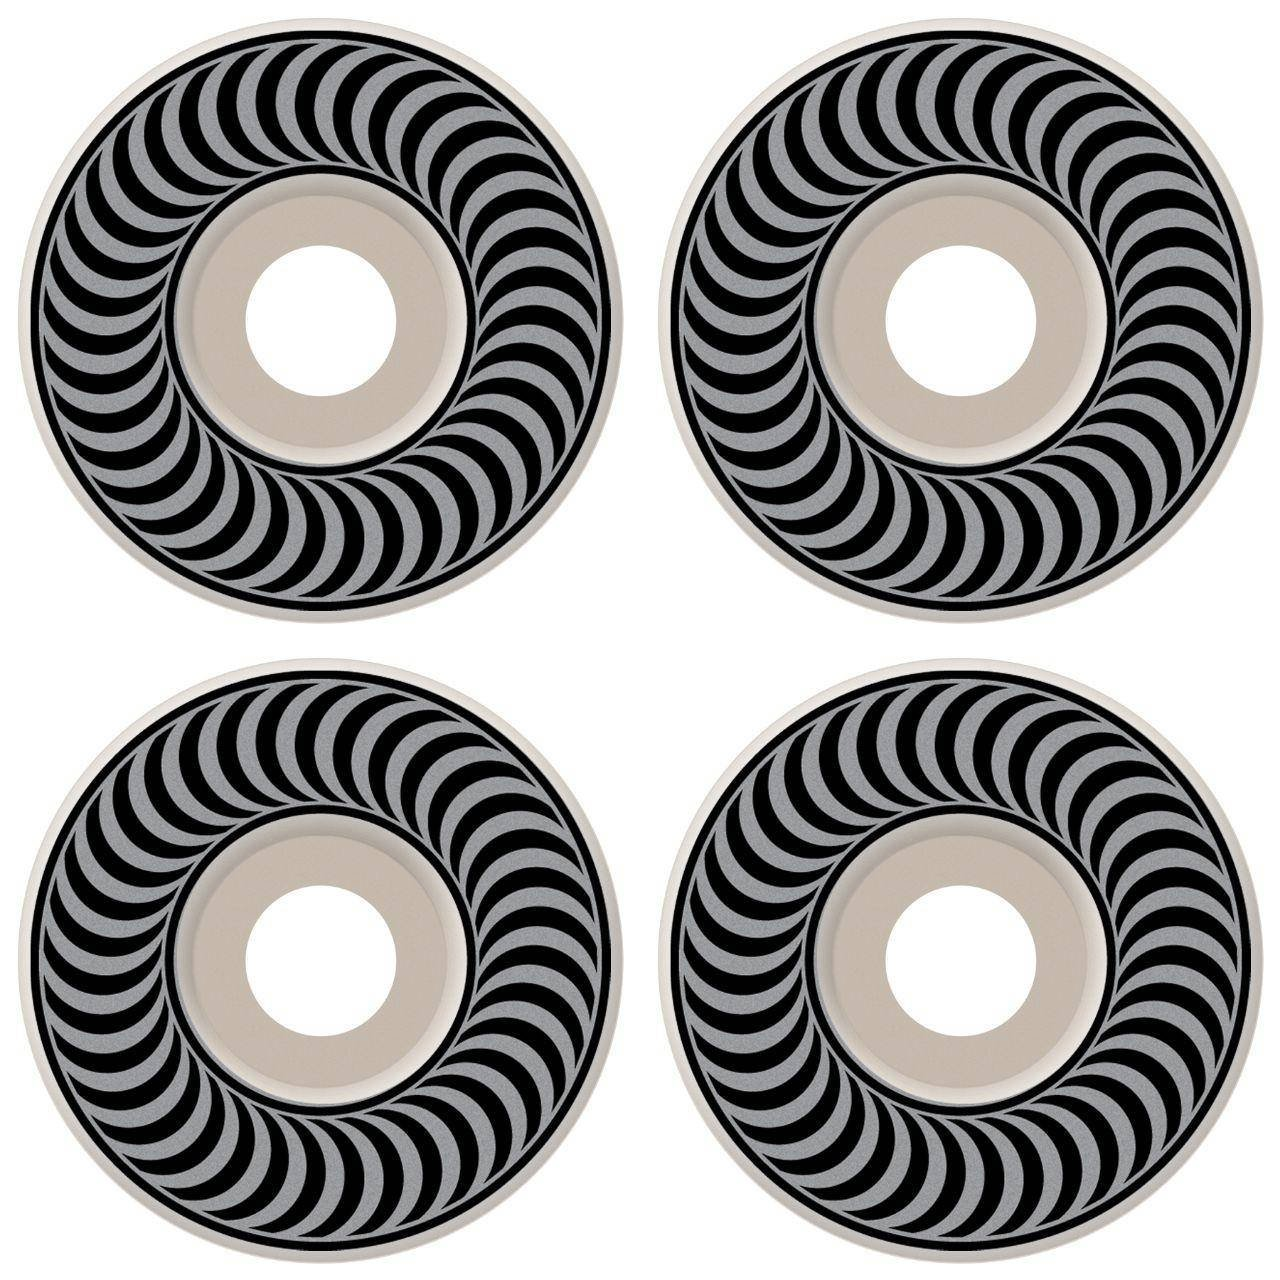 Spitfire Classic Series 54mm High Performance Skateboard Wheel (Set of 4)